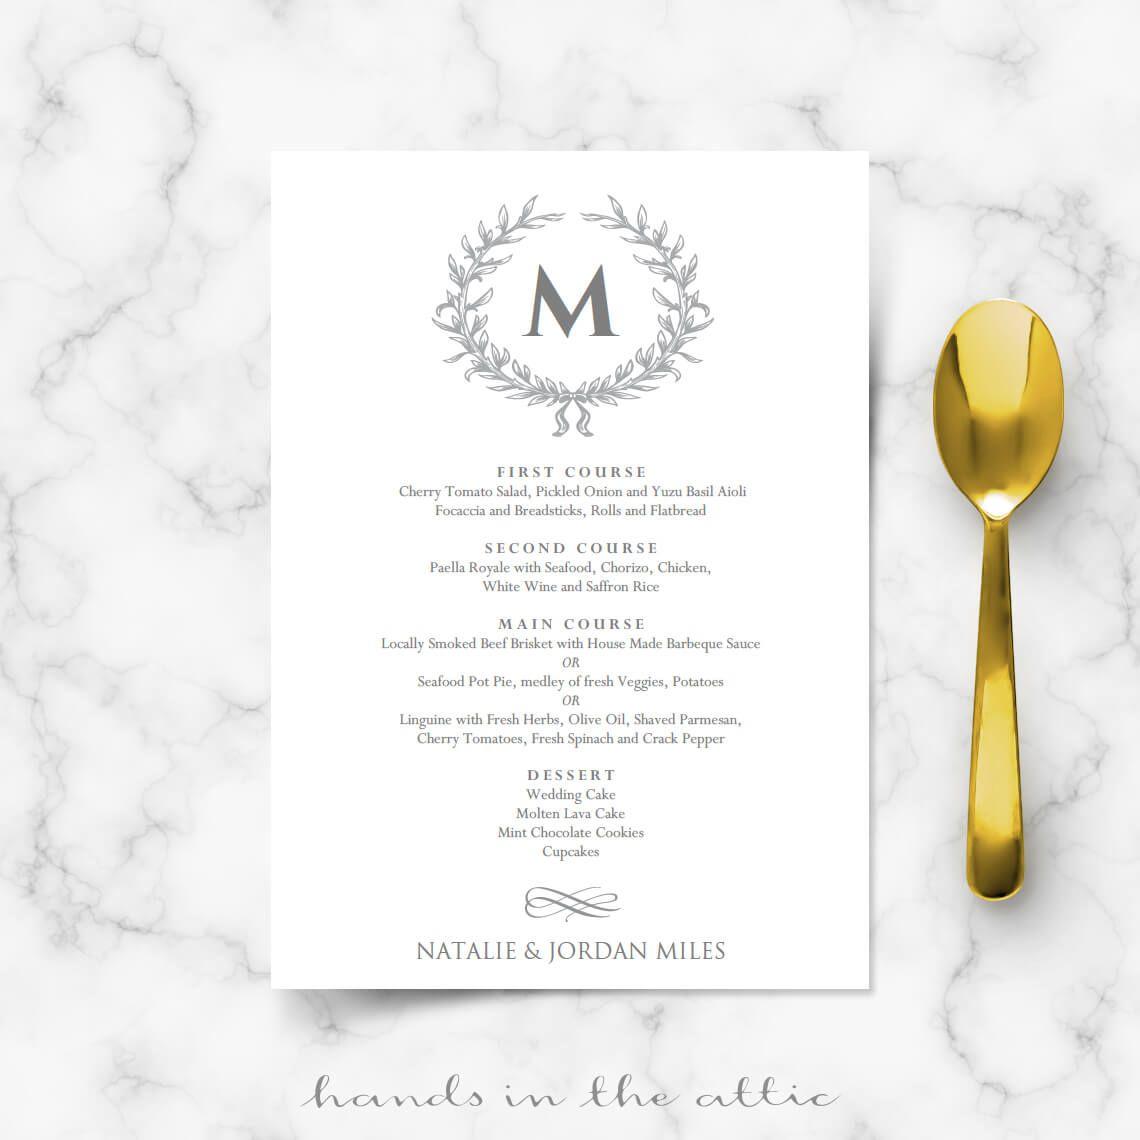 005 Formidable Elegant Wedding Menu Card Template Inspiration  TemplatesFull